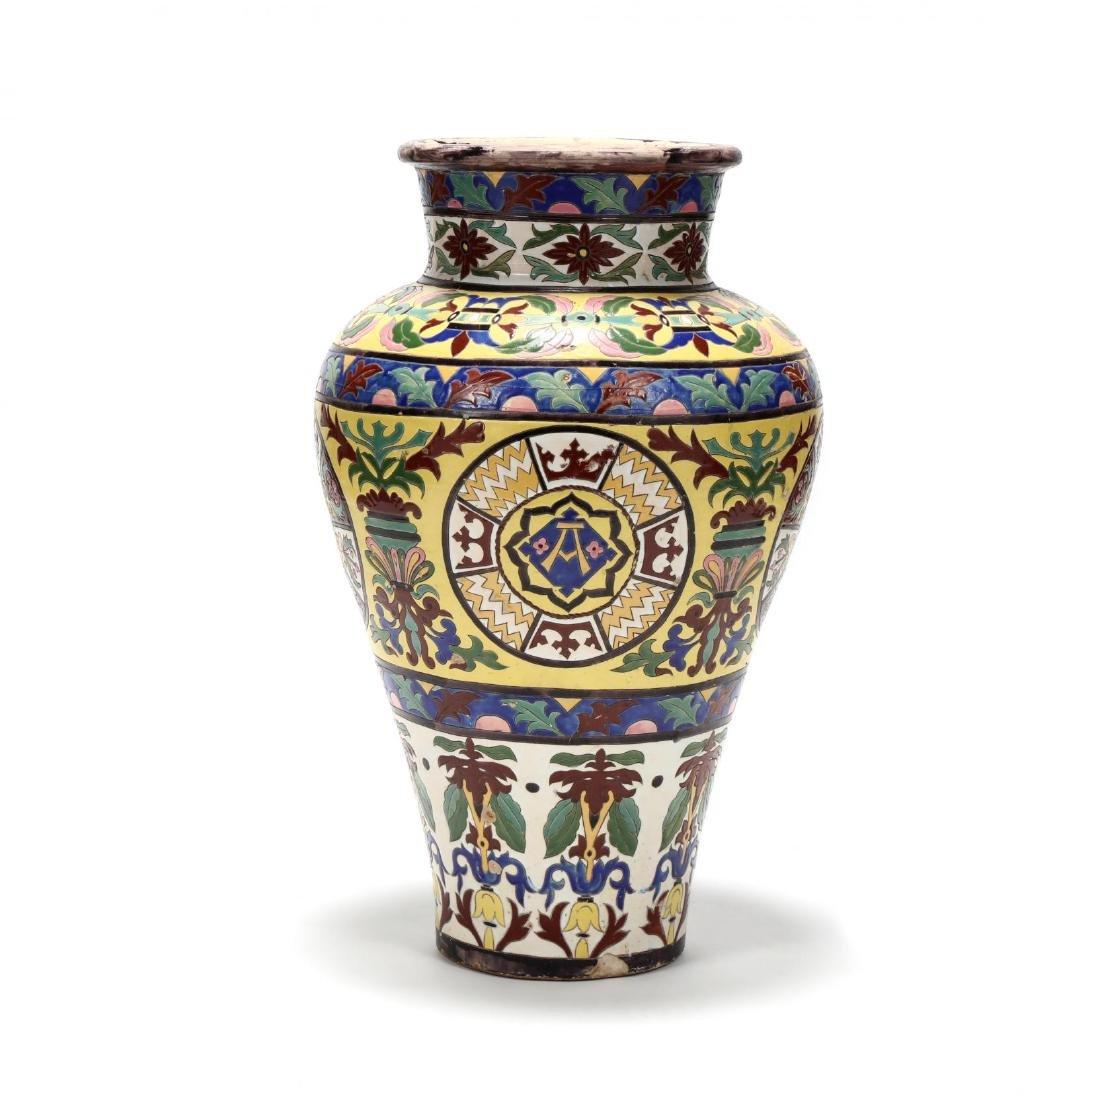 A Large Continental Glazed Pottery Floor Vase